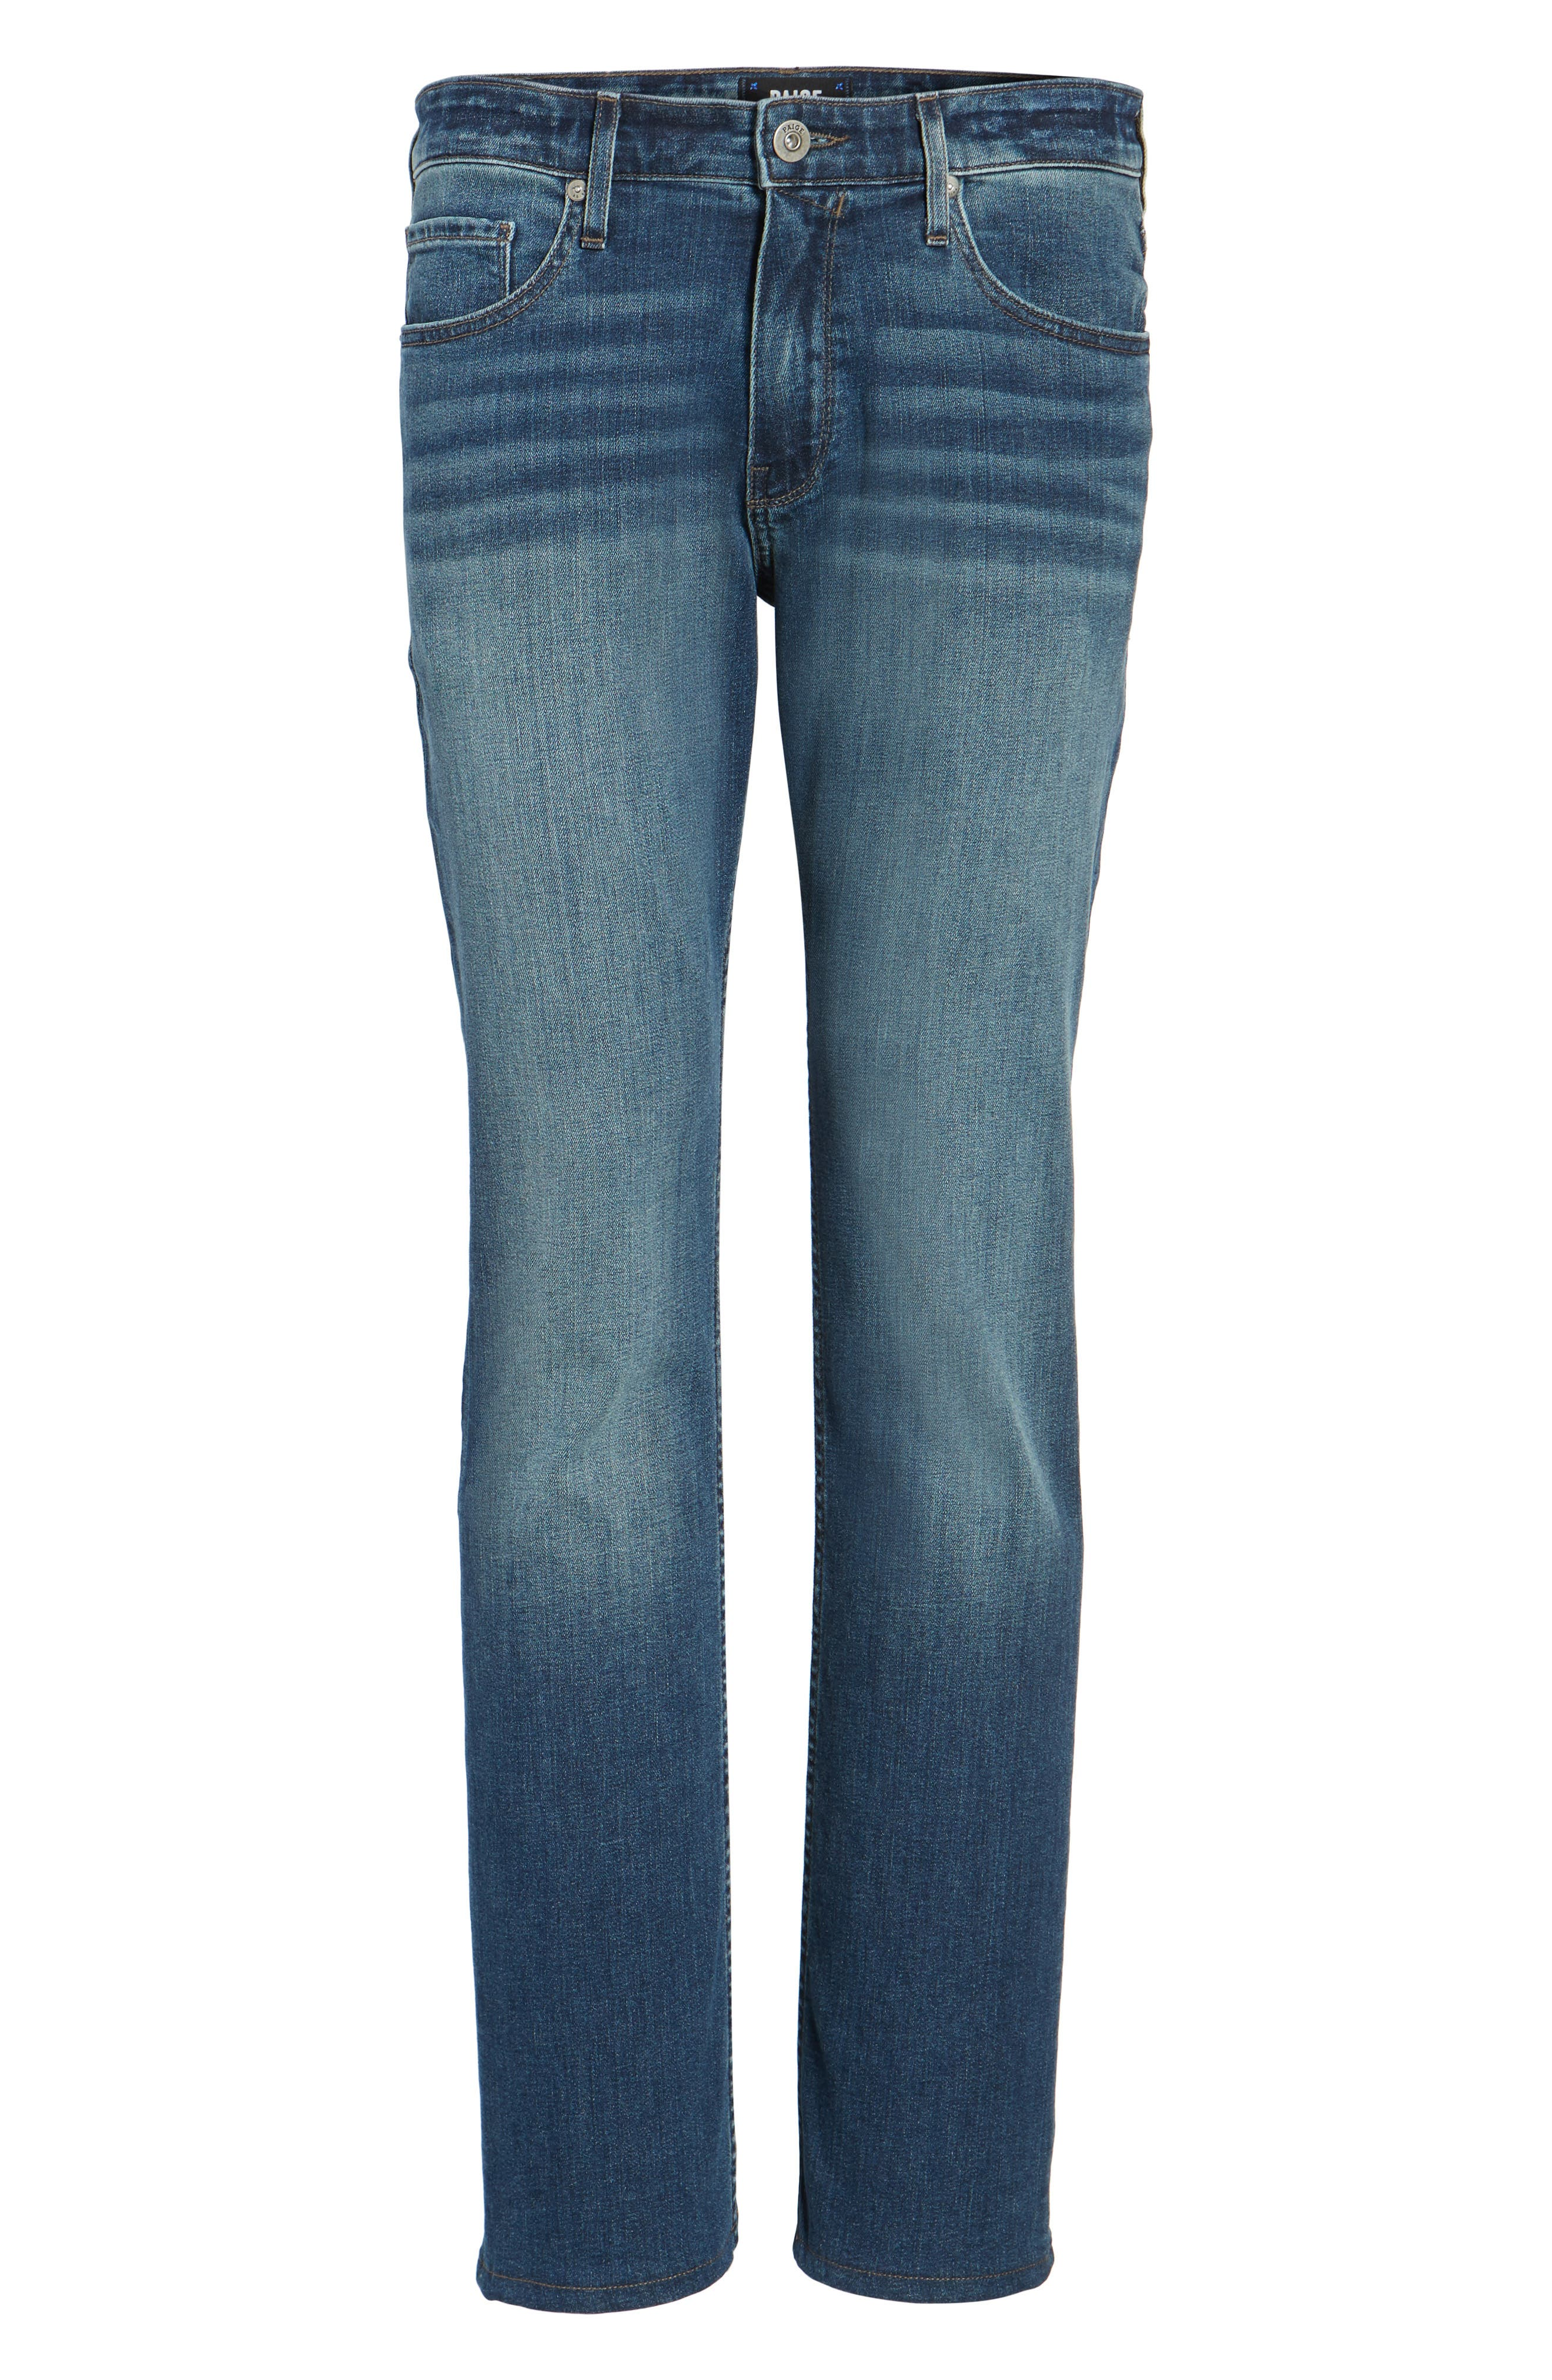 Legacy - Normandie Straight Leg Jeans,                             Alternate thumbnail 6, color,                             400